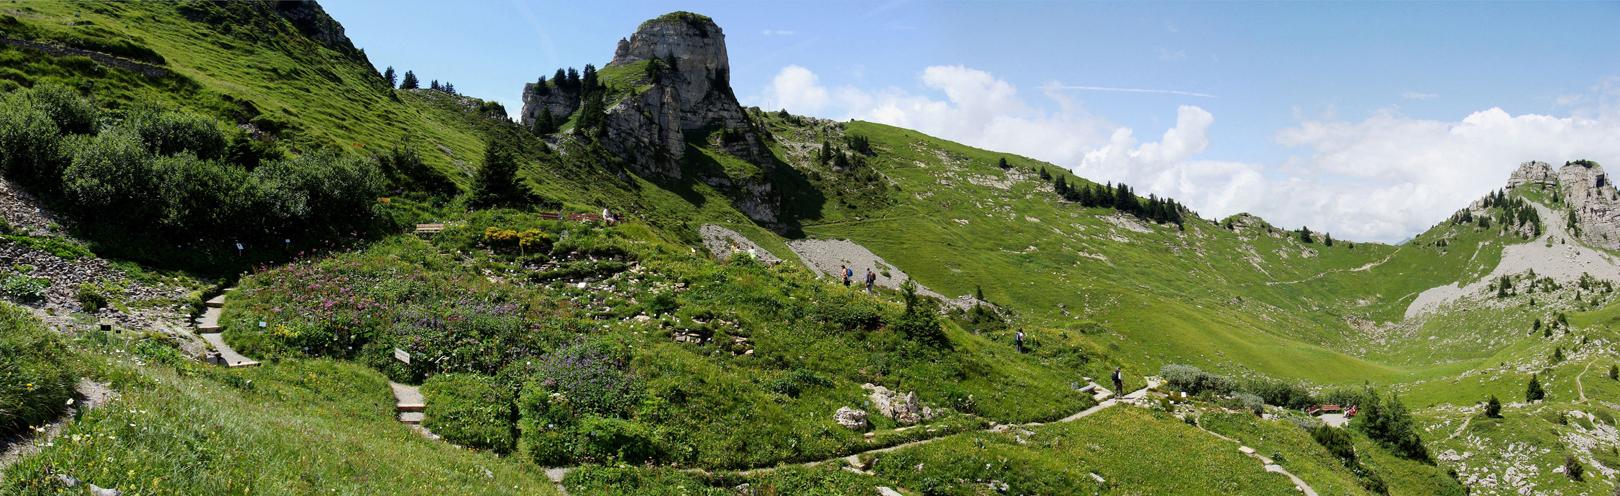 29 Jardin alpin Schynige Platte